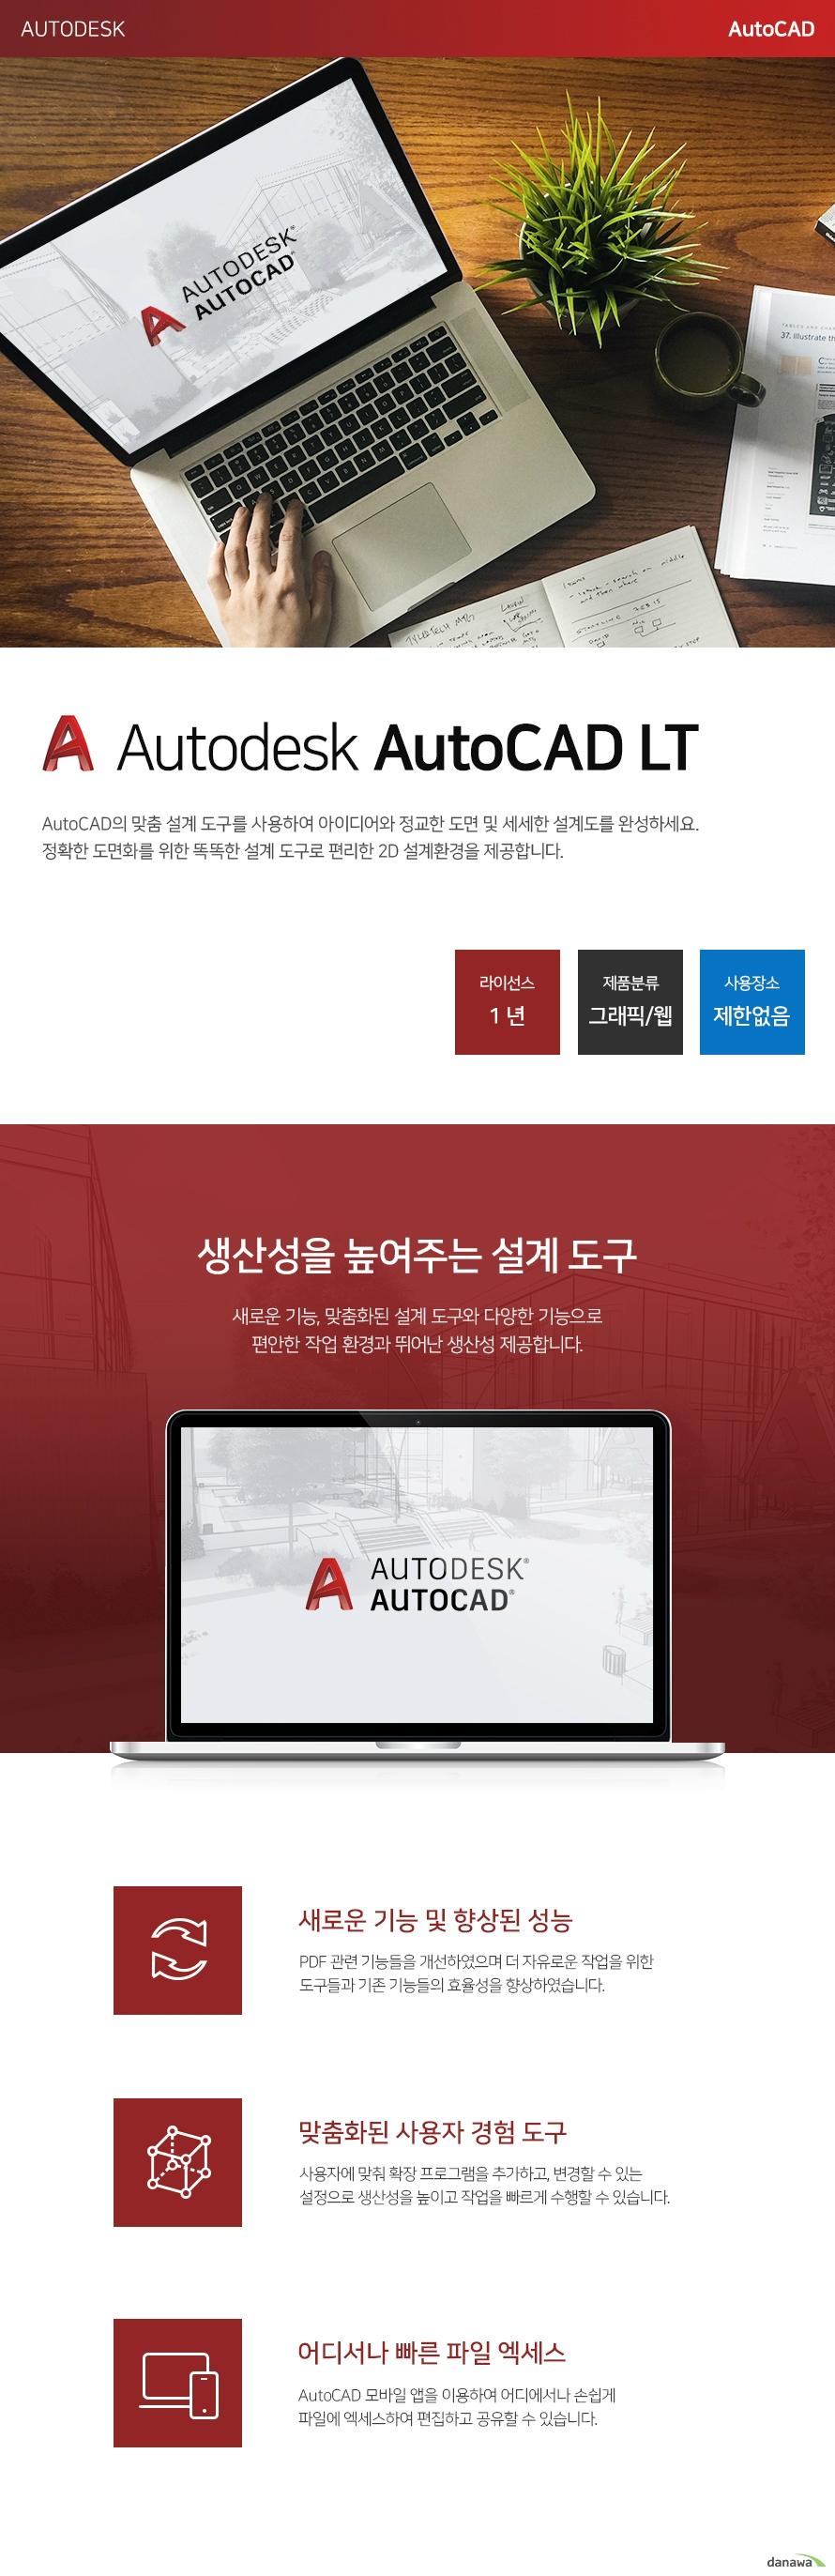 Autodesk AutoCAD AutoCAD의 맞춤 설계 도구를 사용하여 아이디어와 정교한 도면 및 세세한 설계도를 완성하세요. 정확한 도면화를 위한 똑똑한 설계 도구로 편리한 설계환경을 제공합니다. 생산성을 높여주는 설계 도구 새로운 기능, 맞춤화된 설계 도구와 다양한 기능으로 편안한 작업 환경과 뛰어난 생산성 제공합니다. 새로운 기능 및 향상된 성능 PDF 관련 기능들을 개선하였으며 더 자유로운 작업을 위한 도구들과 기존 기능들의 효율성을 향상하였습니다. 맞춤화된 사용자 경험 도구 사용자에 맞춰 확장 프로그램을 추가하고, 변경할 수 있는 설정으로 생산성을 높이고 작업을 빠르게 수행할 수 있습니다. 어디서나 빠른 파일 엑세스 AutoCAD 모바일 앱을 이용하여 어디에서나 손쉽게  파일에 엑세스하여 편집하고 공유할 수 있습니다. 신속하고 정교한 설계 Autodesk AutoCAD